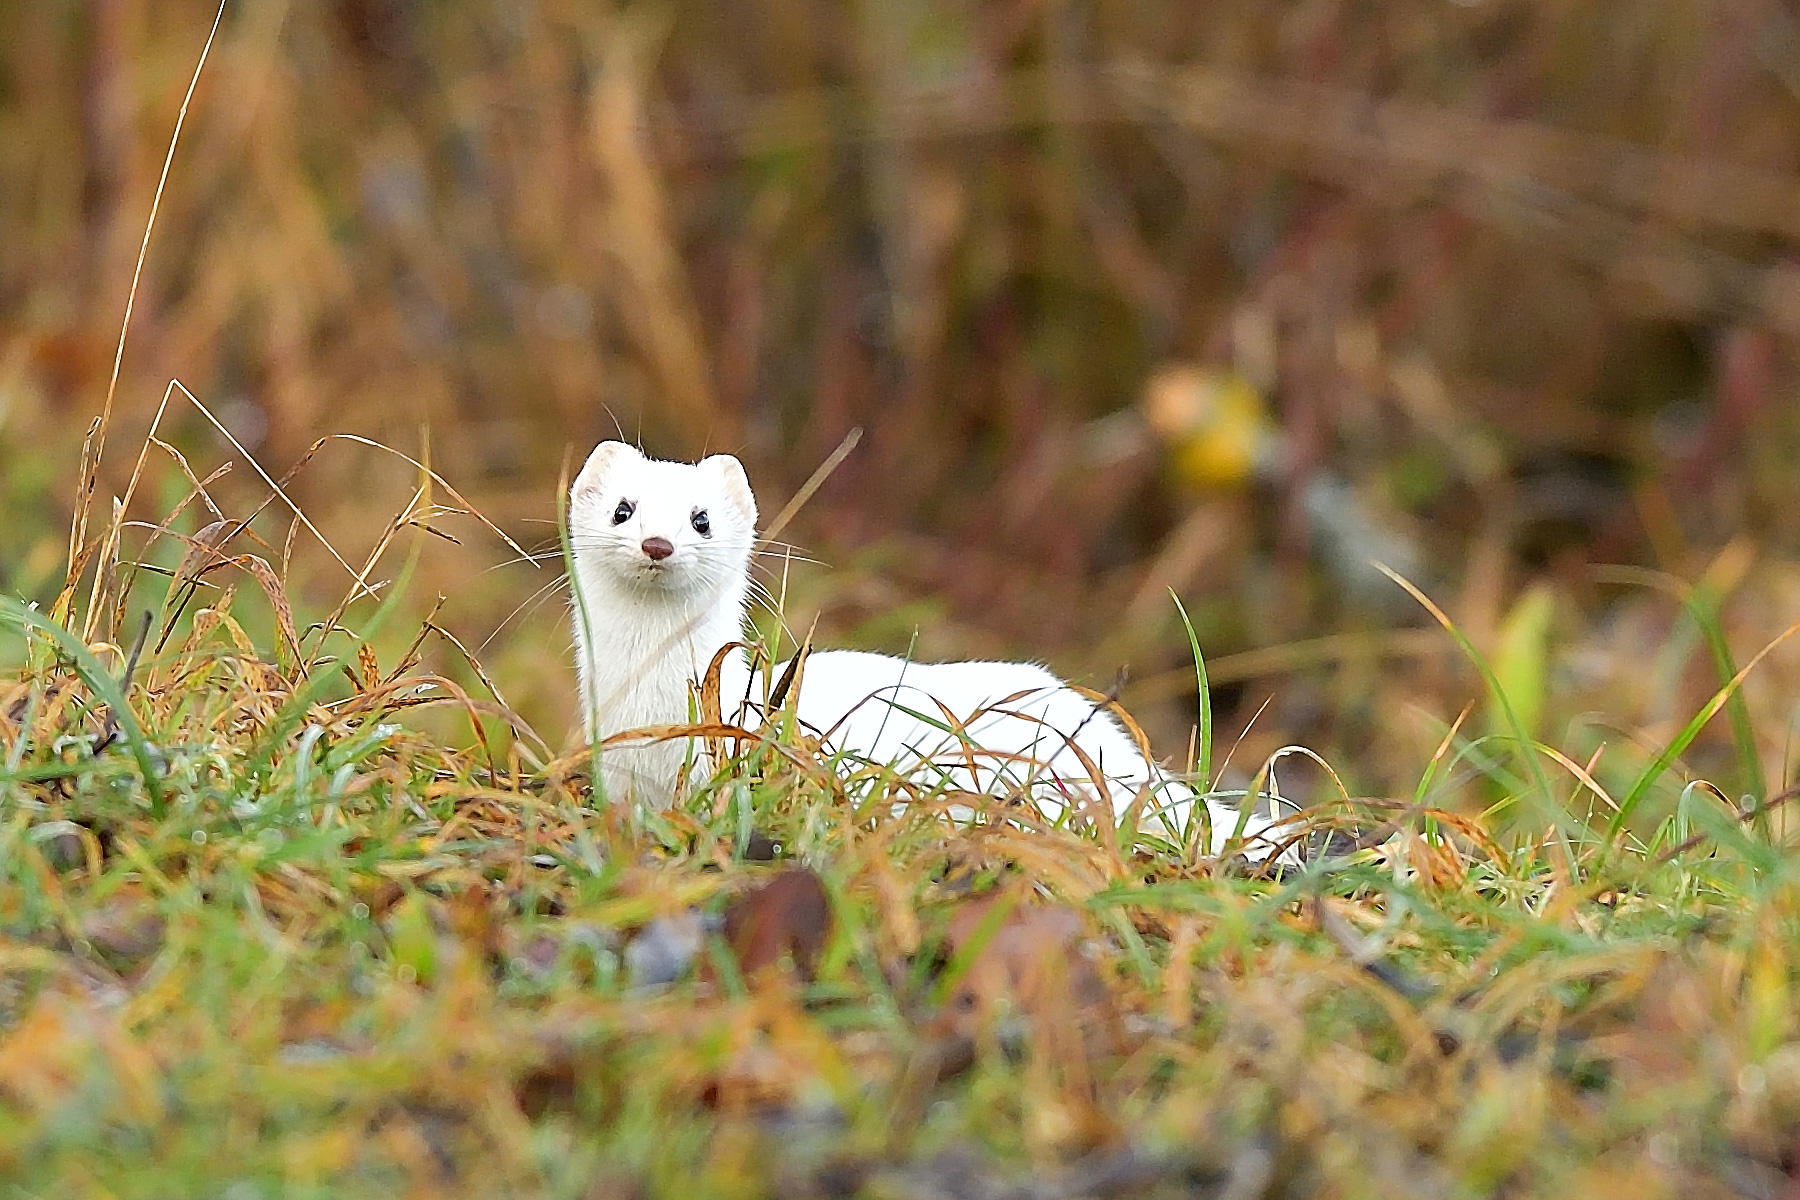 Hermelin (Mustela erminea) im Winterkleid